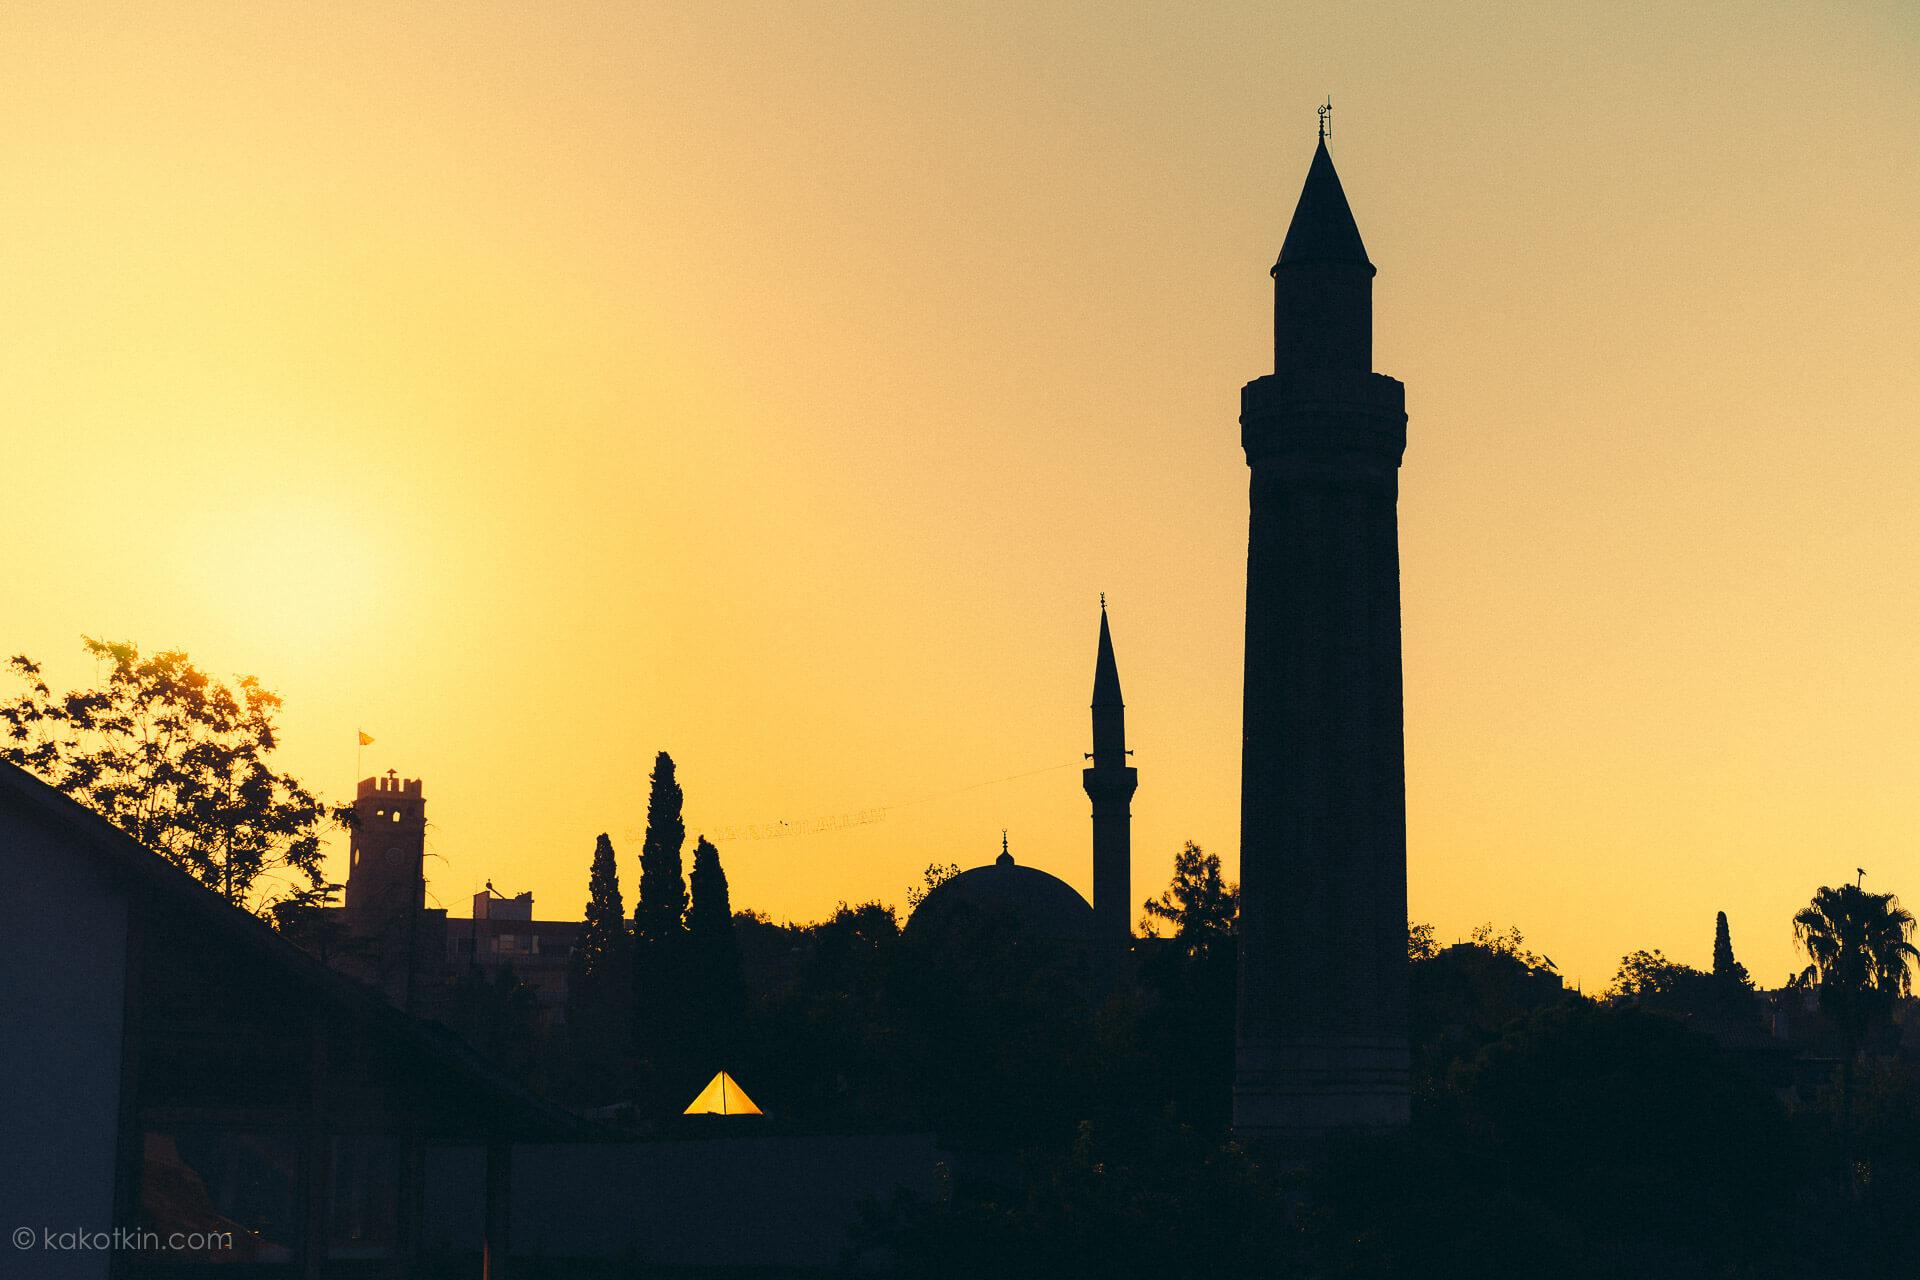 Старый город Калейчи Анталия мечети силуэт на солнце